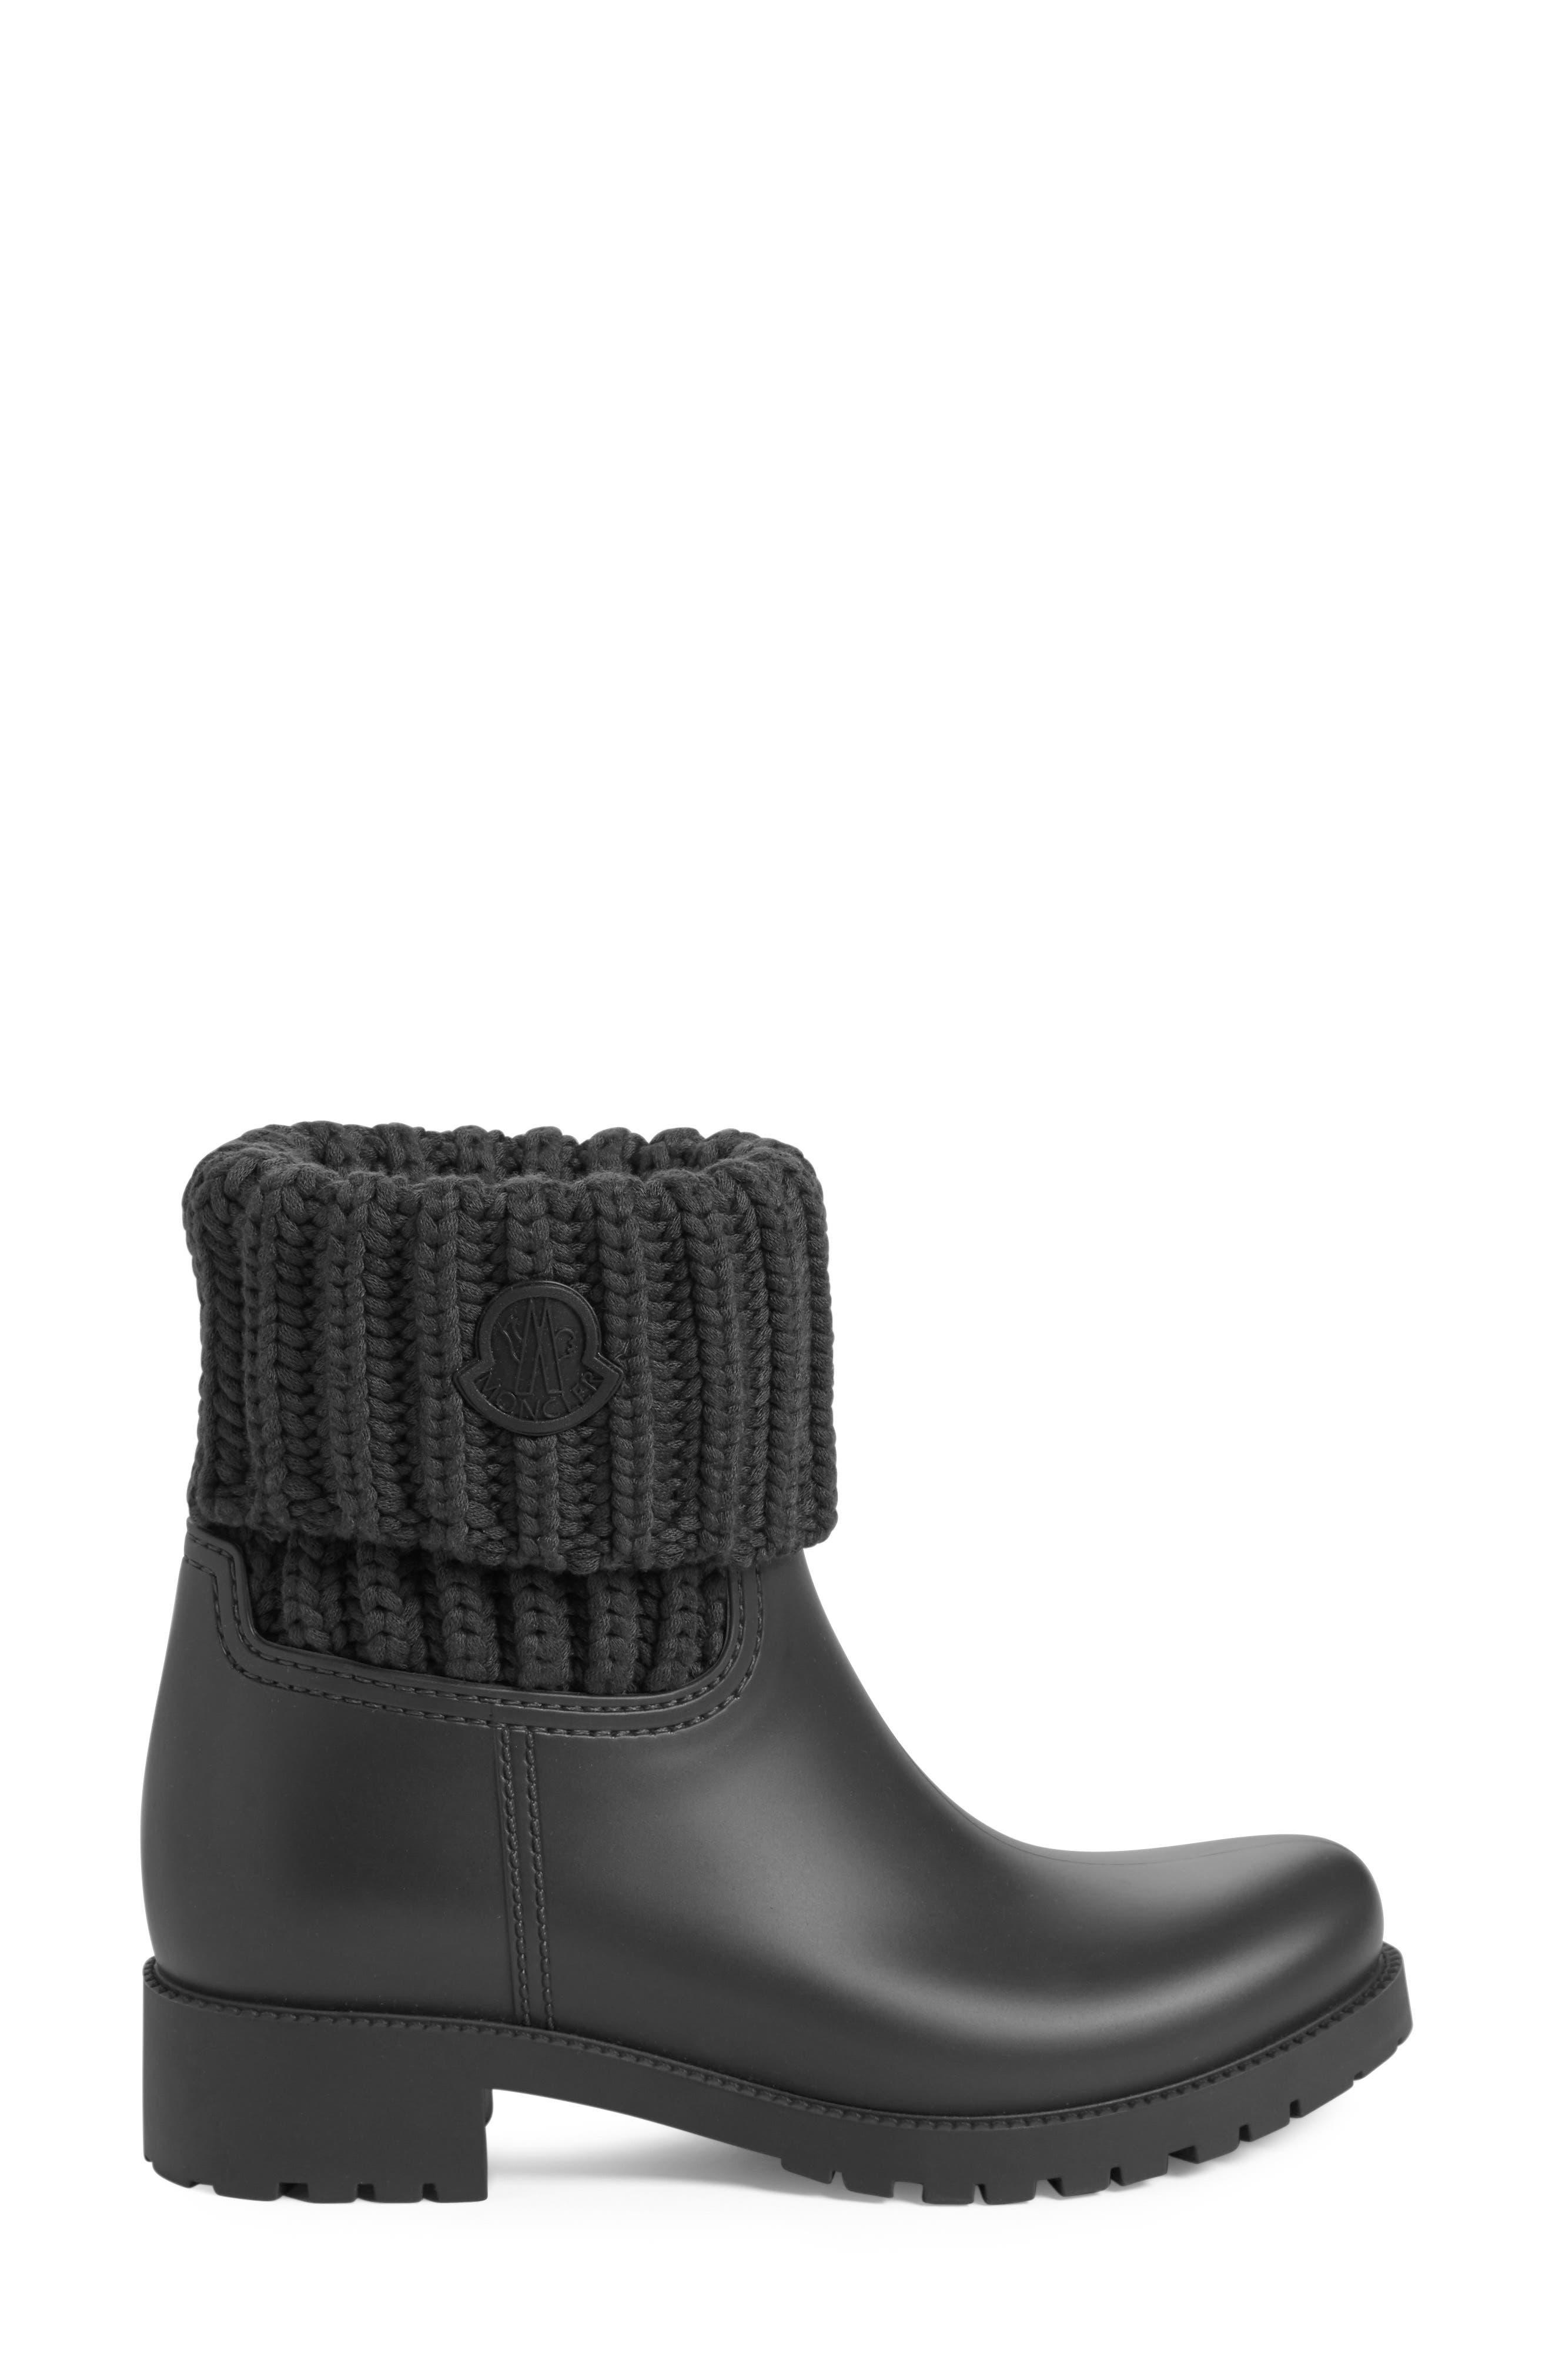 Alternate Image 4  - Moncler 'Ginette' Knit Cuff Leather Rain Boot (Women)